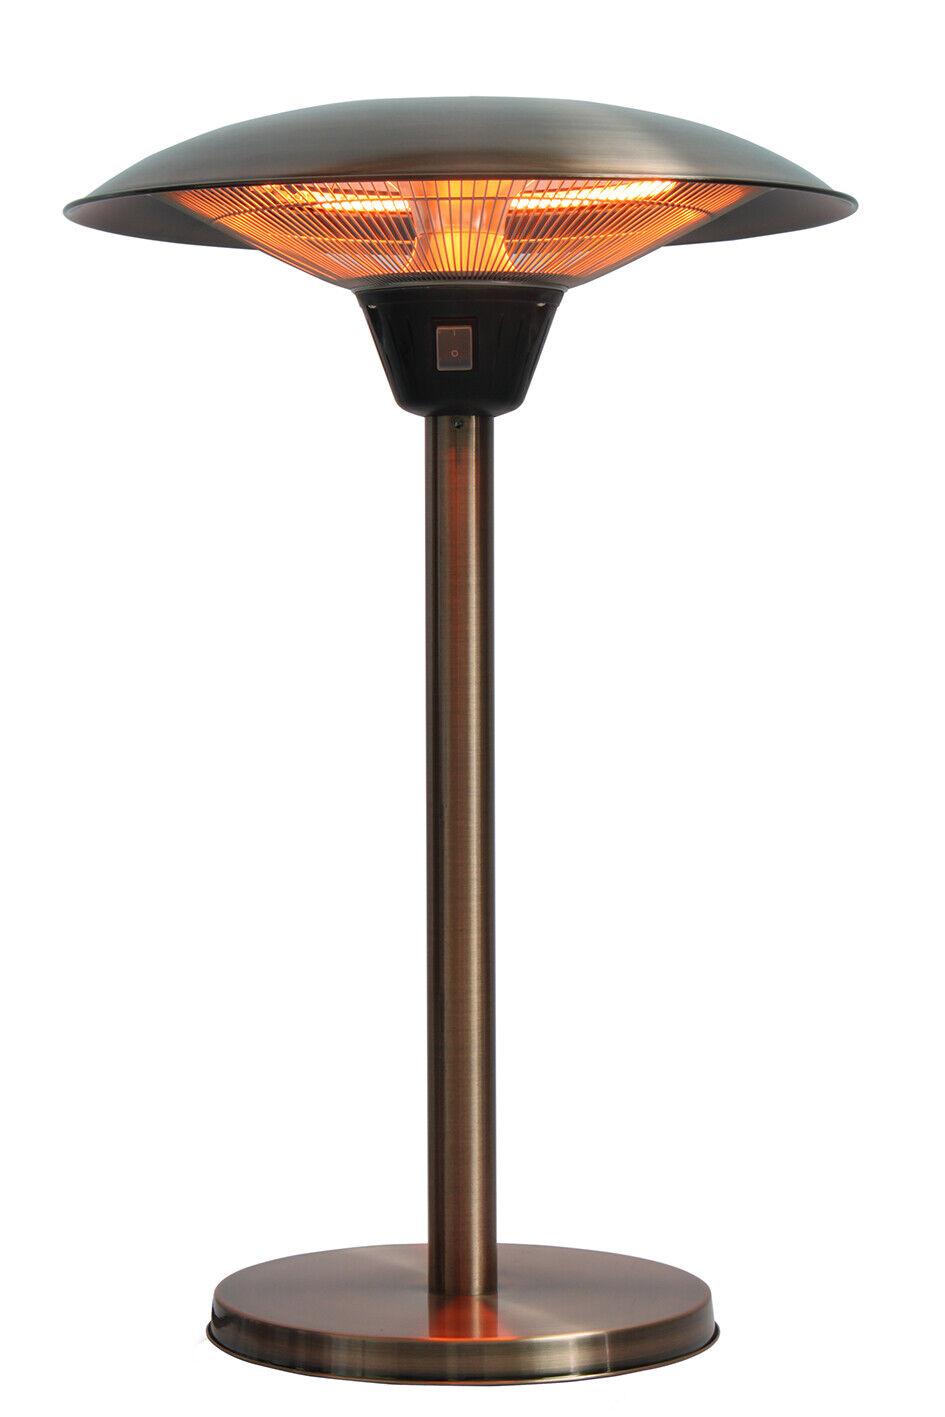 Fire Sense Cimarron Brushed Copper Colored Table Top Halogen